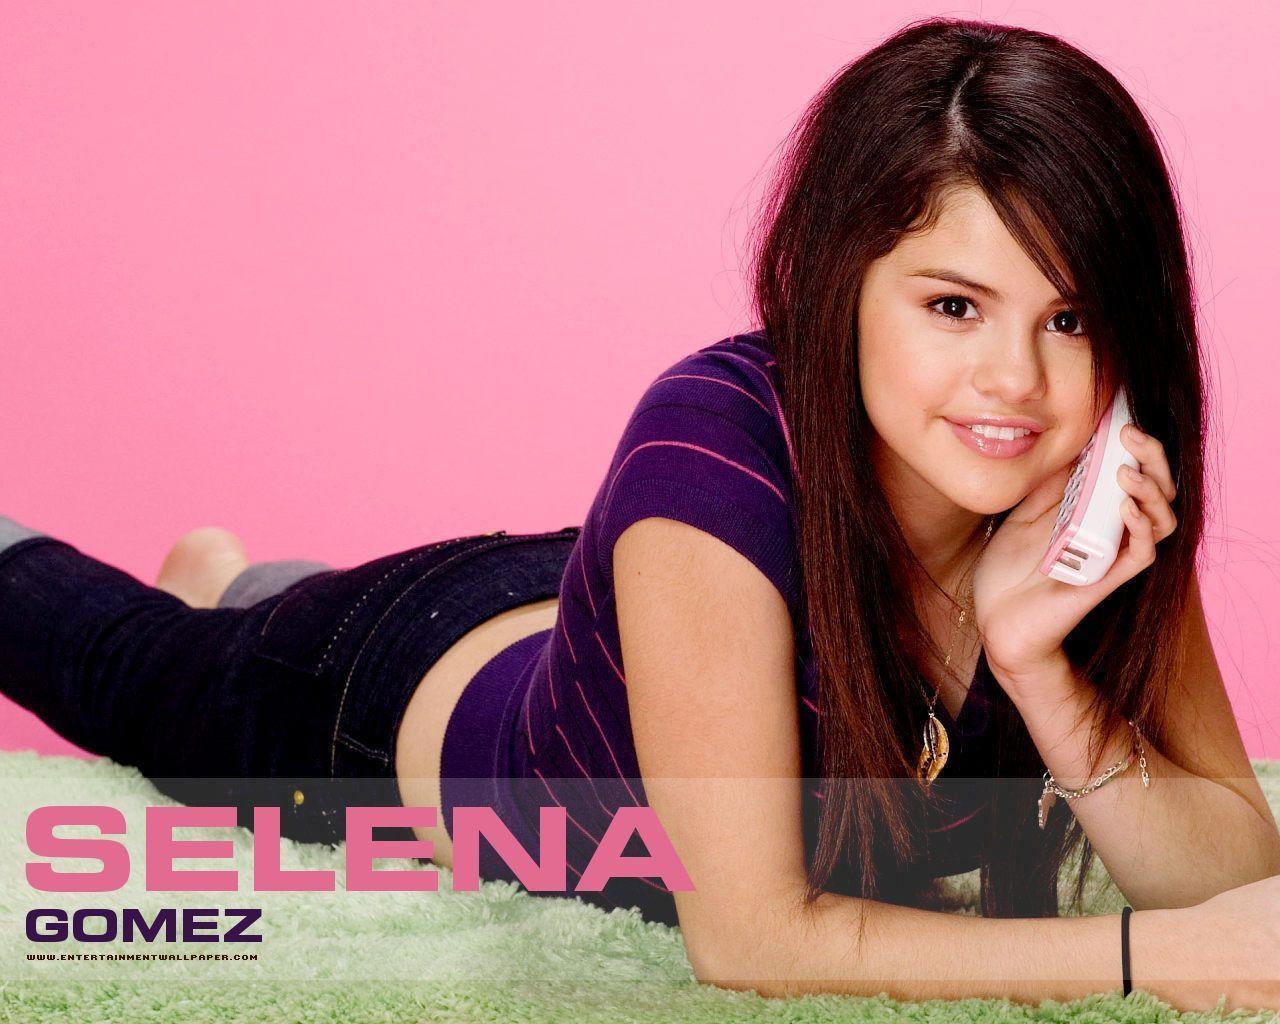 Selena Gomez Wallpaper 35 Backgrounds | Wallruru.com